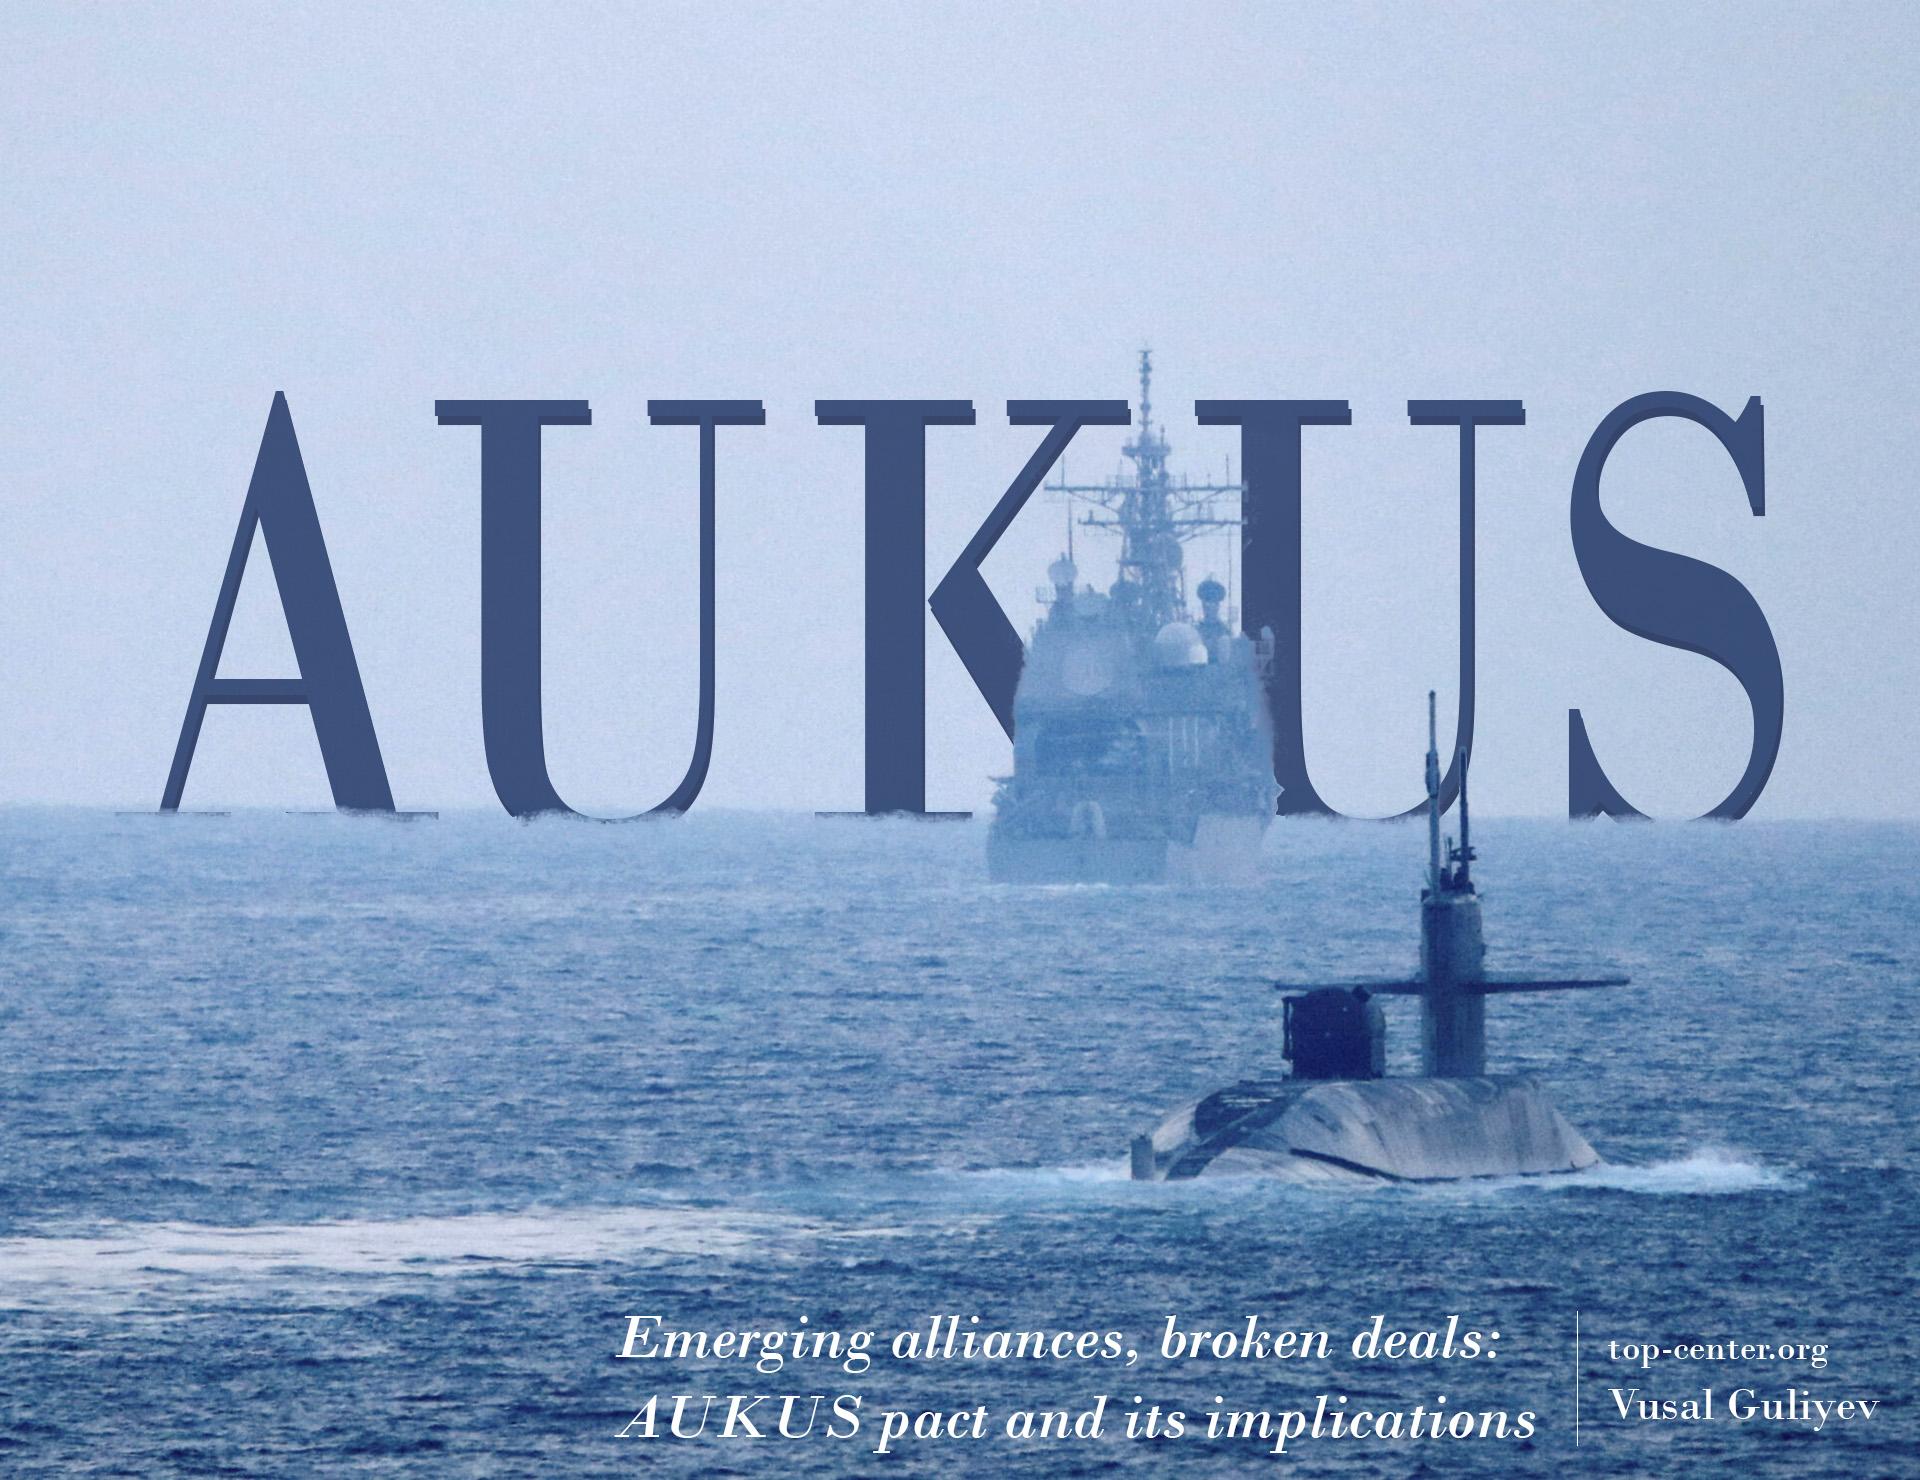 Emerging alliances, broken deals: AUKUS pact and its implications